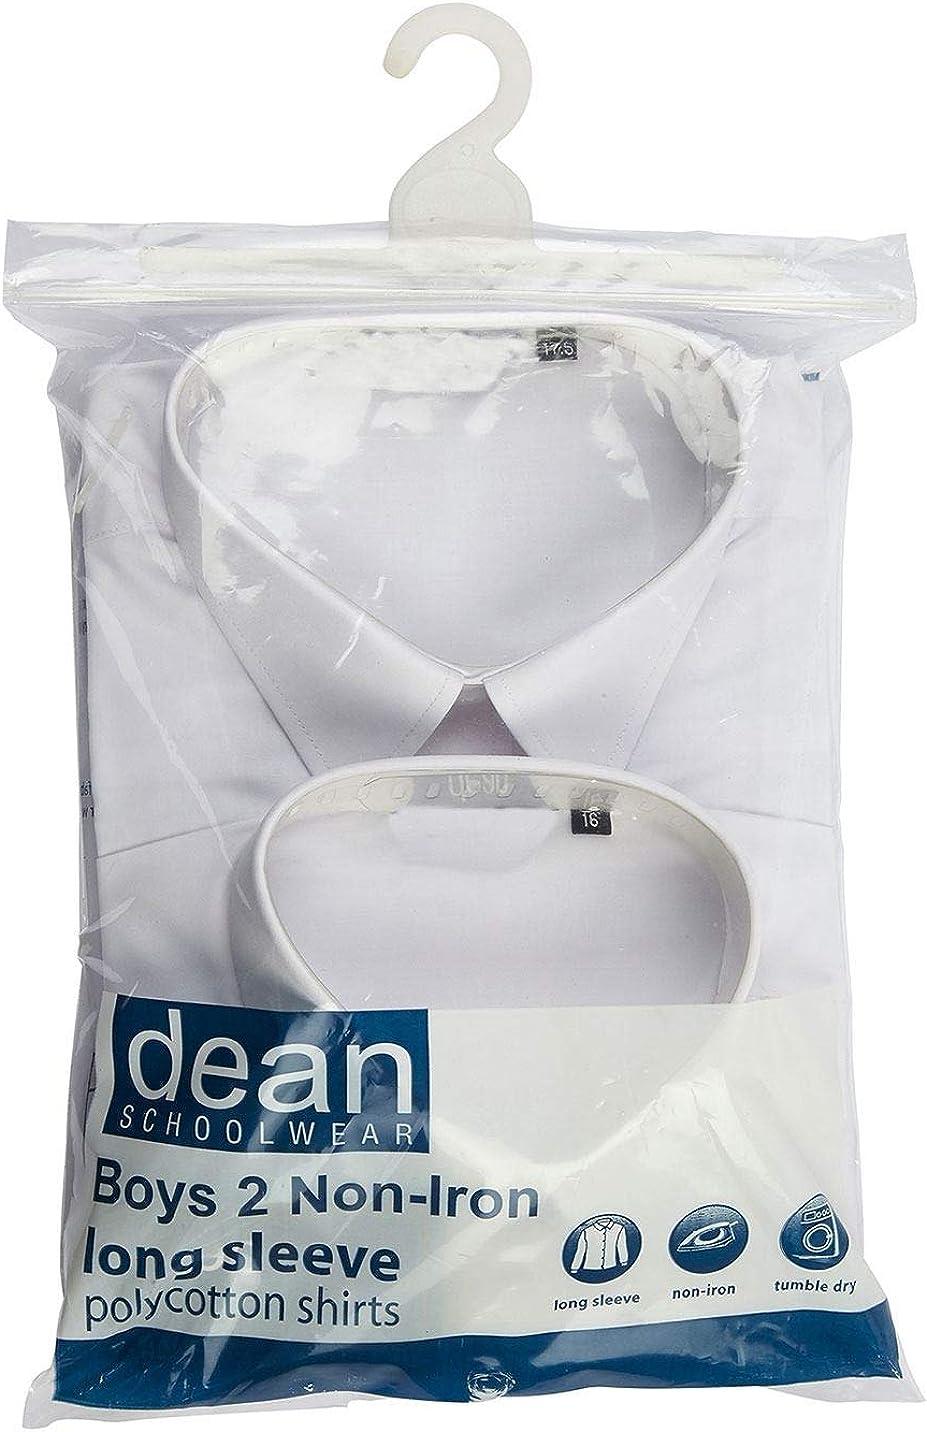 Rimi Hanger Boys School Shirt Pack of 2 Short Long Sleeve Non Iron School Uniform Shirt 11-17.5 Inches Collar